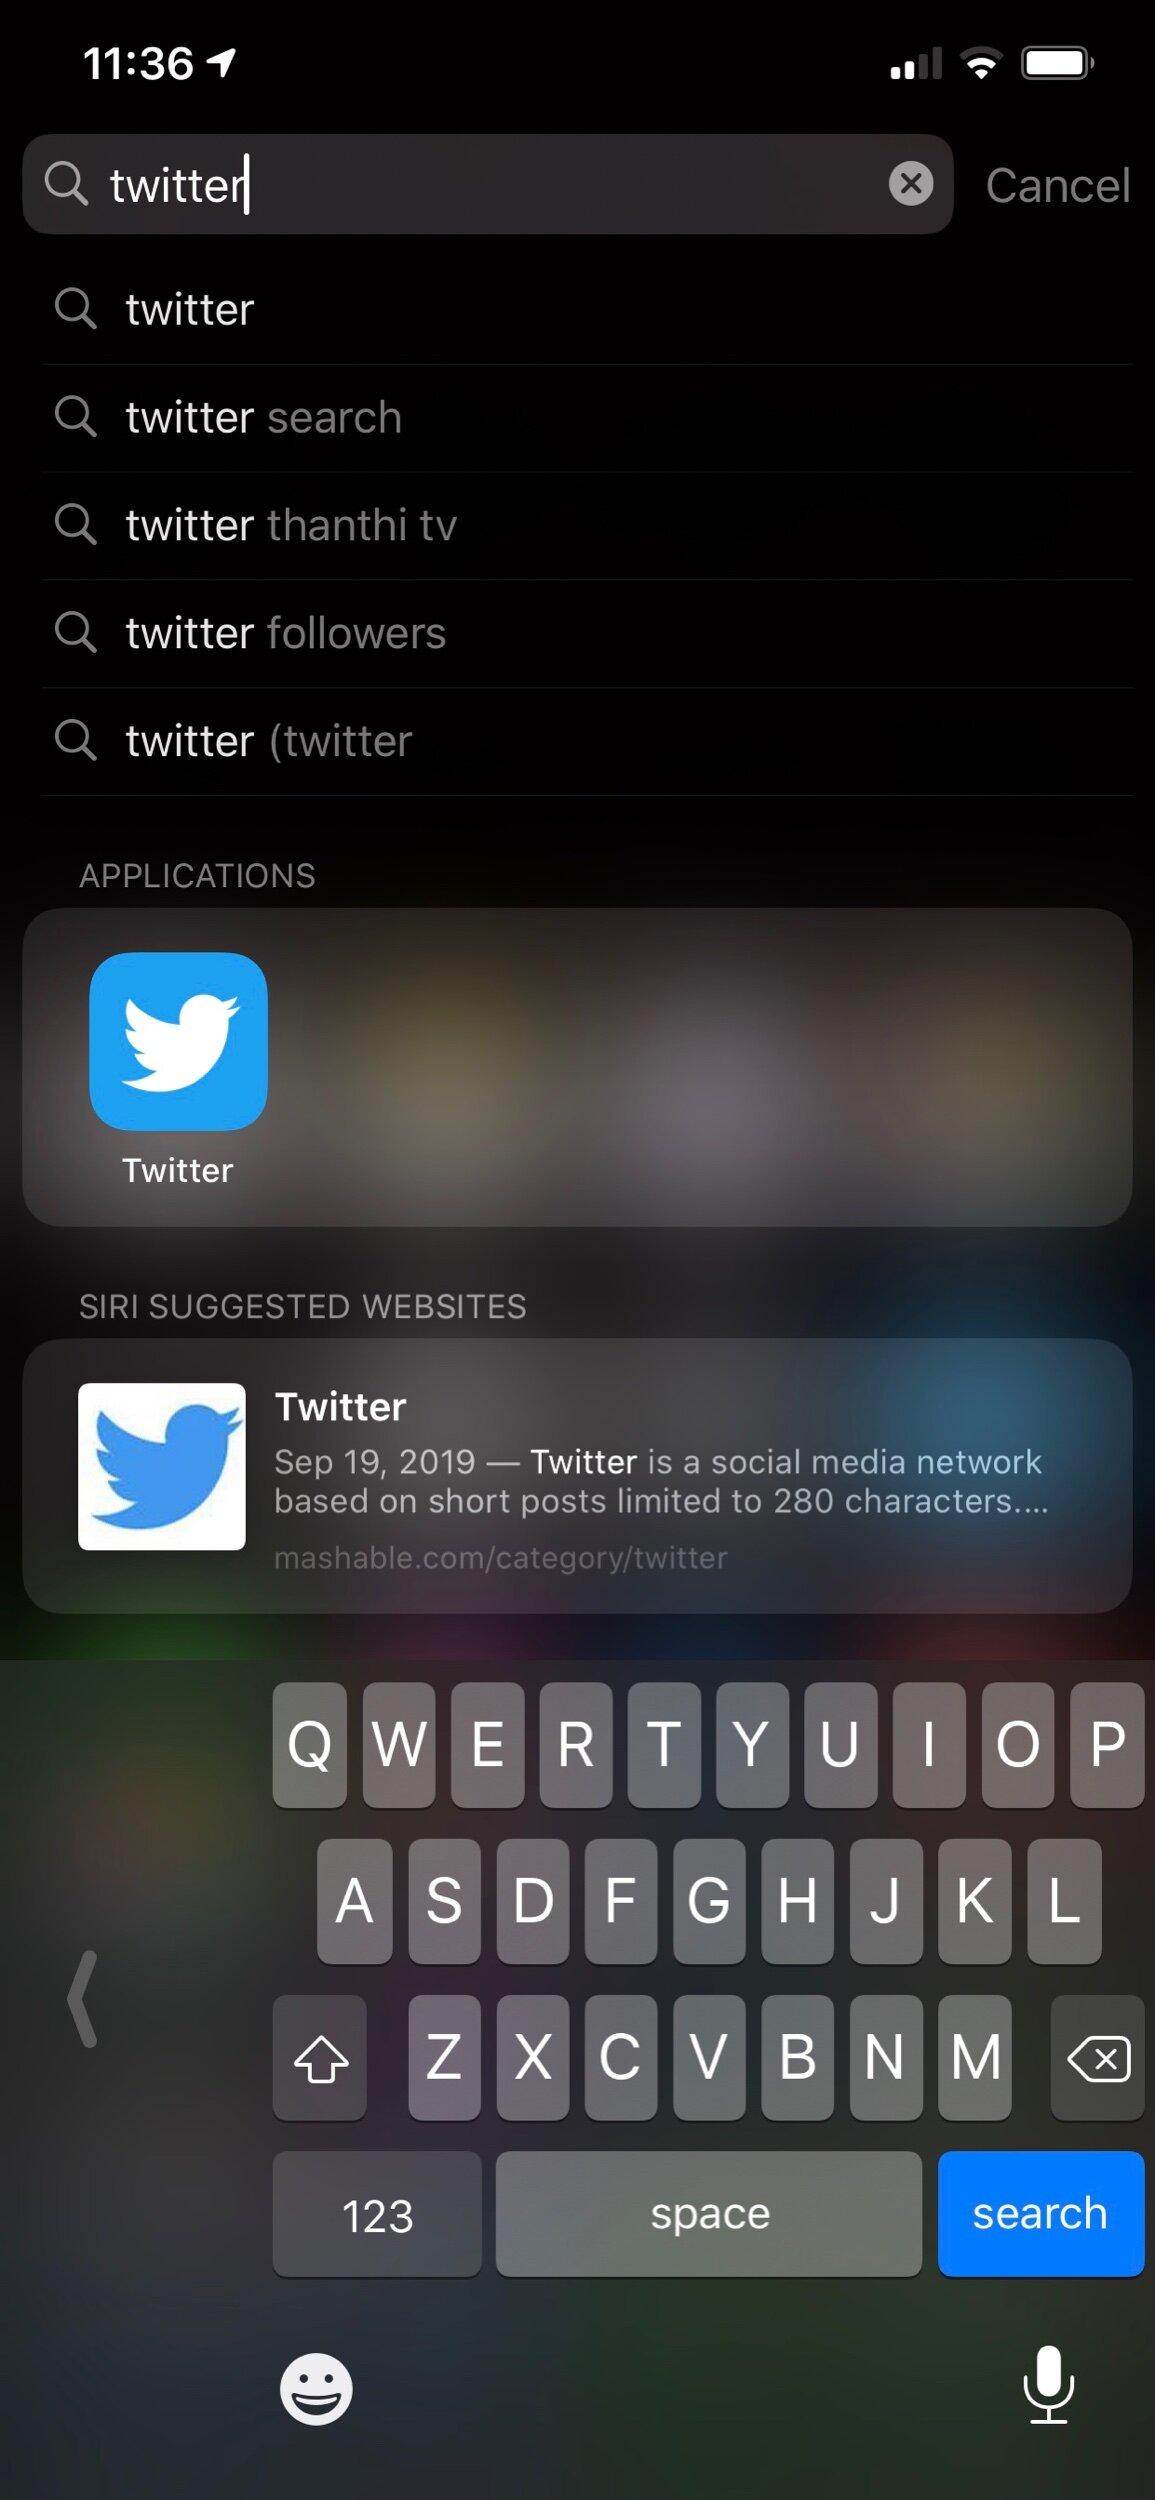 Spotlight feature on iPhone 11 Pro Max